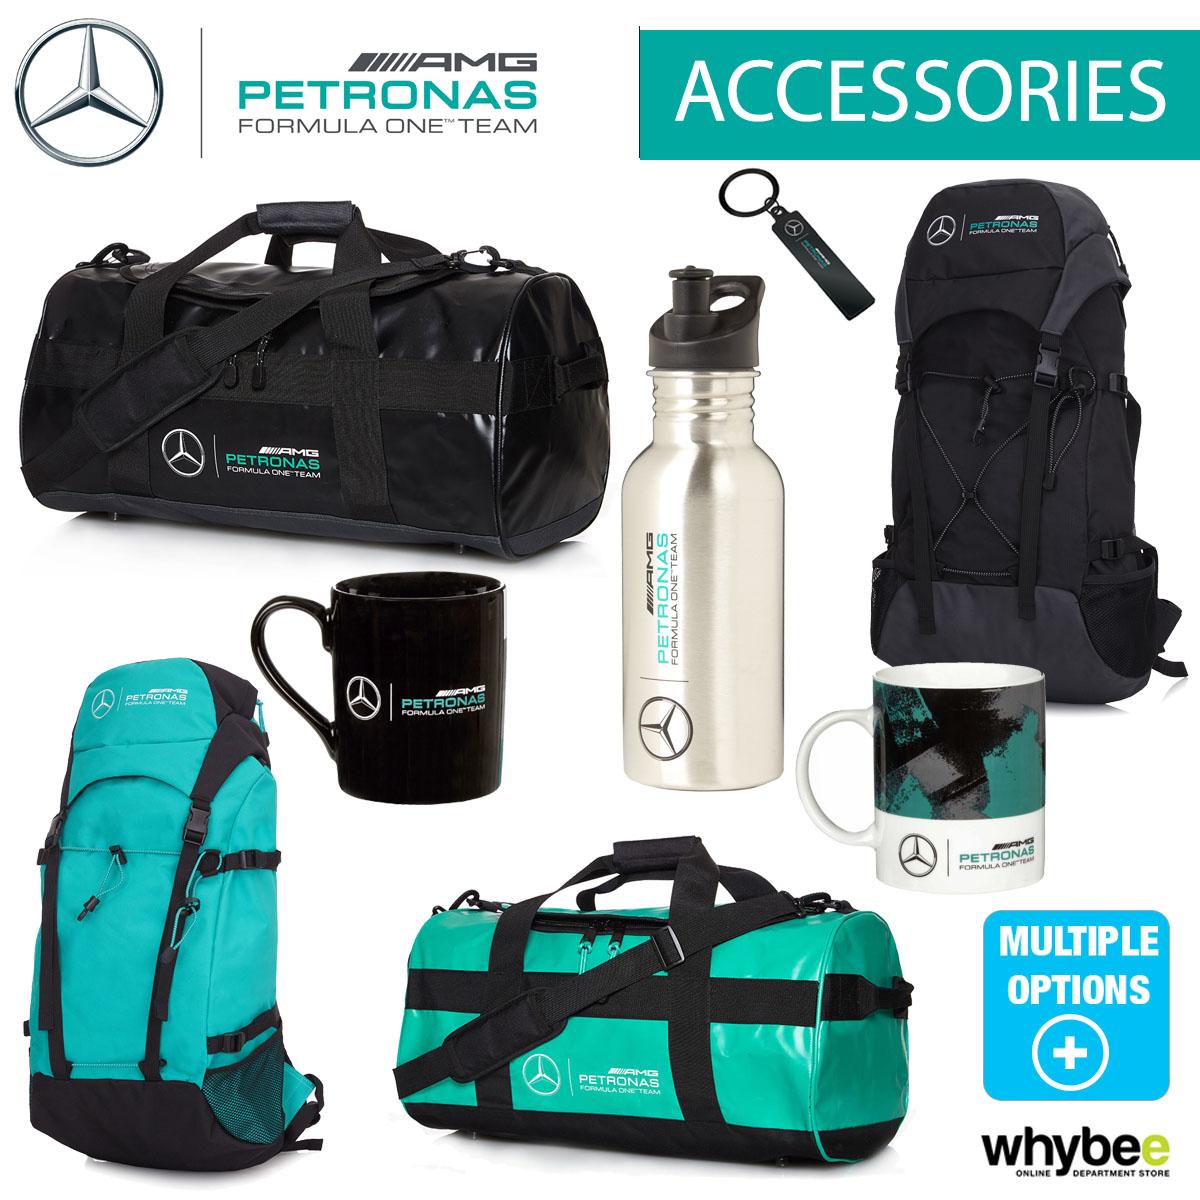 sale! 2016 mercedes-amg f1 formula one team accessories bag